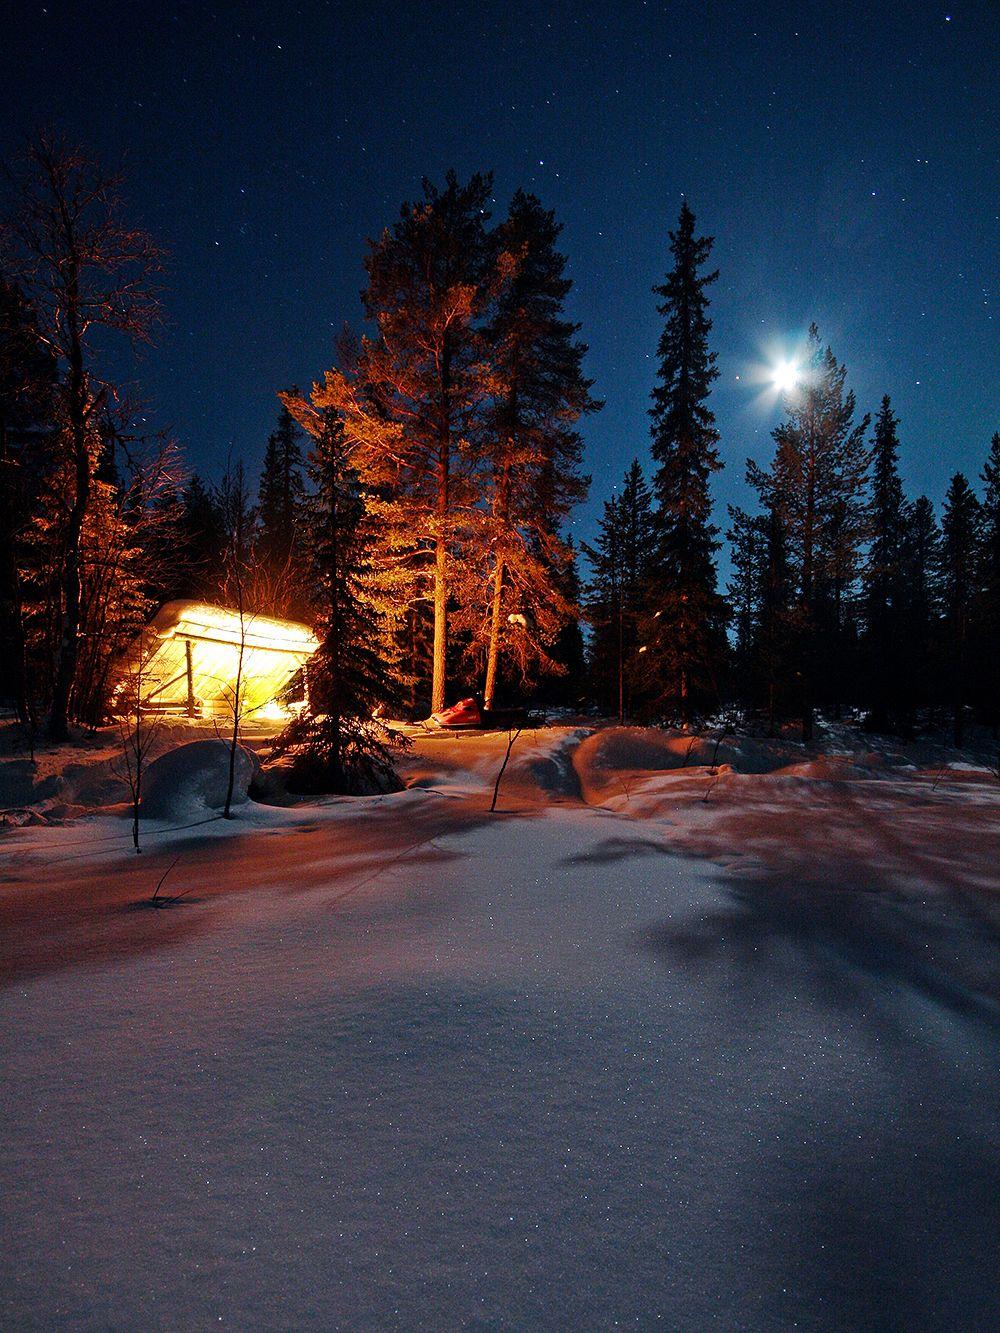 Yö ulkona talvella